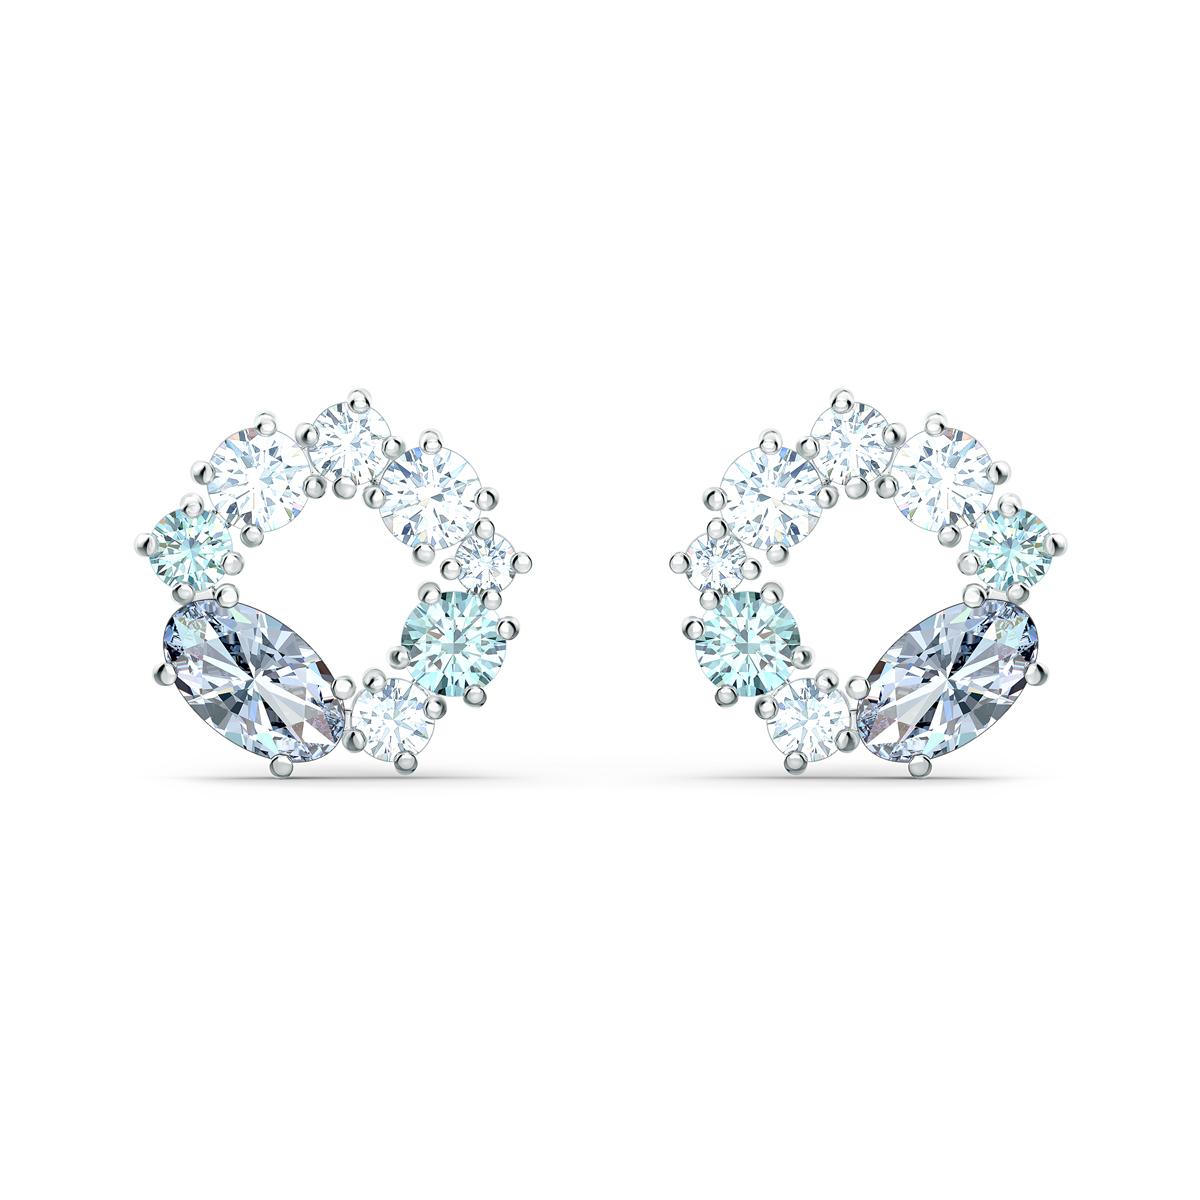 Swarovski Attract Circle Stud Pierced Earrings, Multicolored, Rhodium Plated